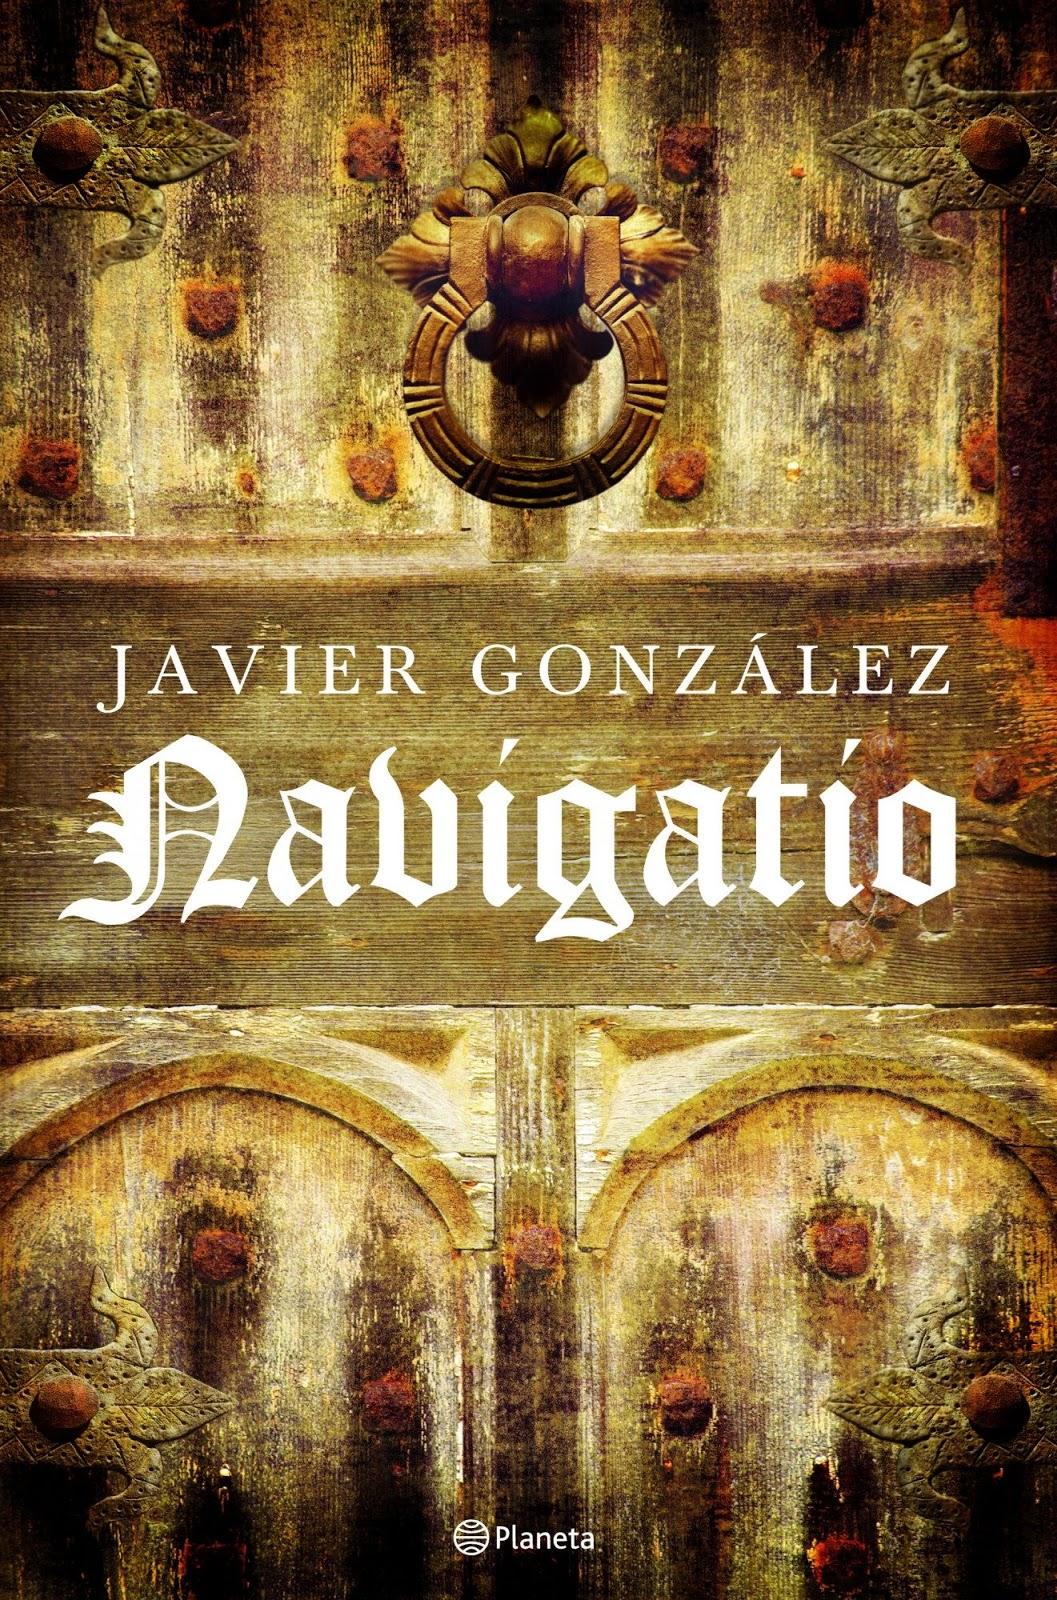 Navigatio – Javier González